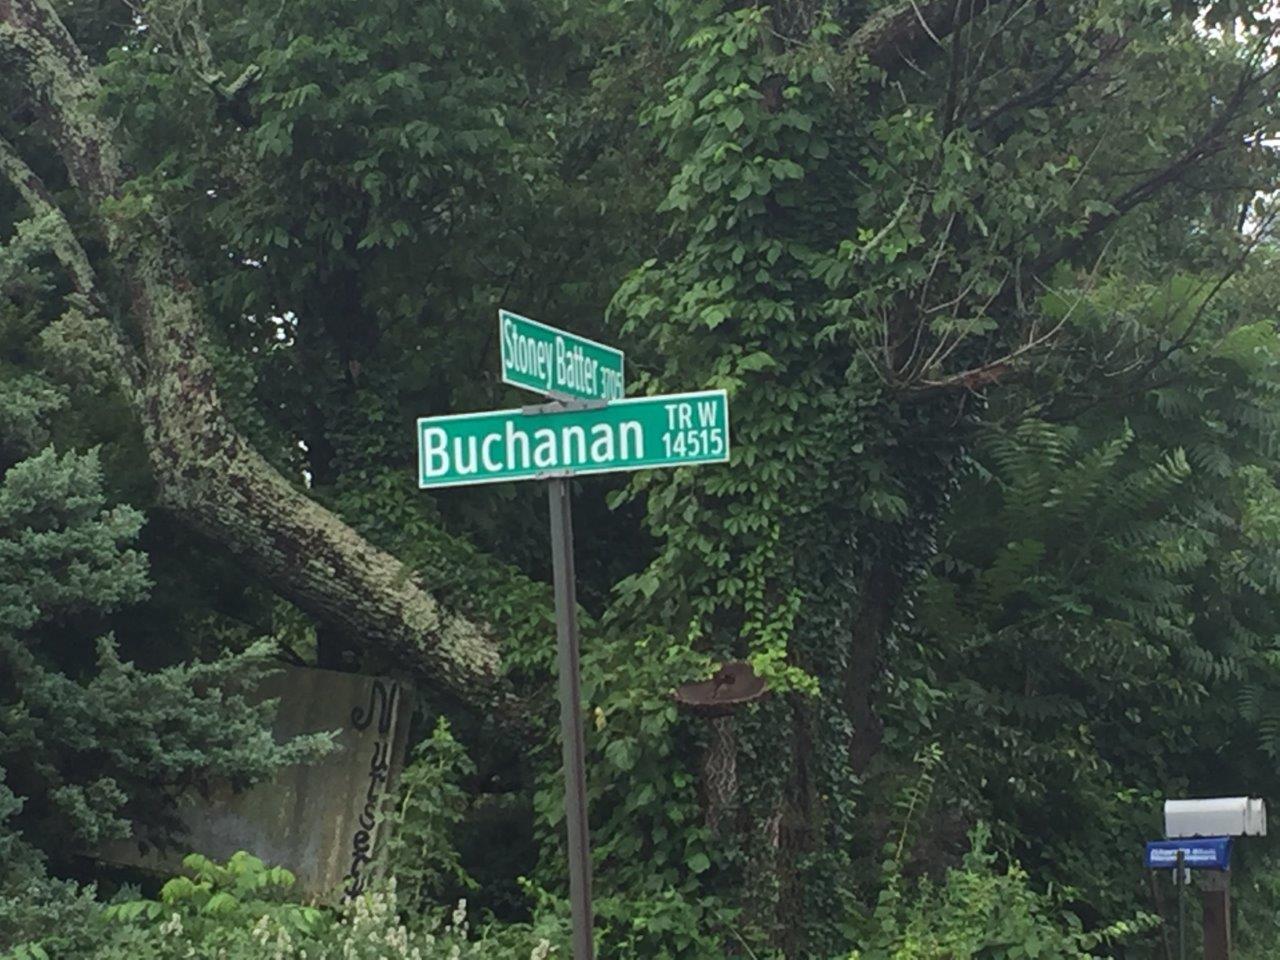 buchanan trail and stoney batter road